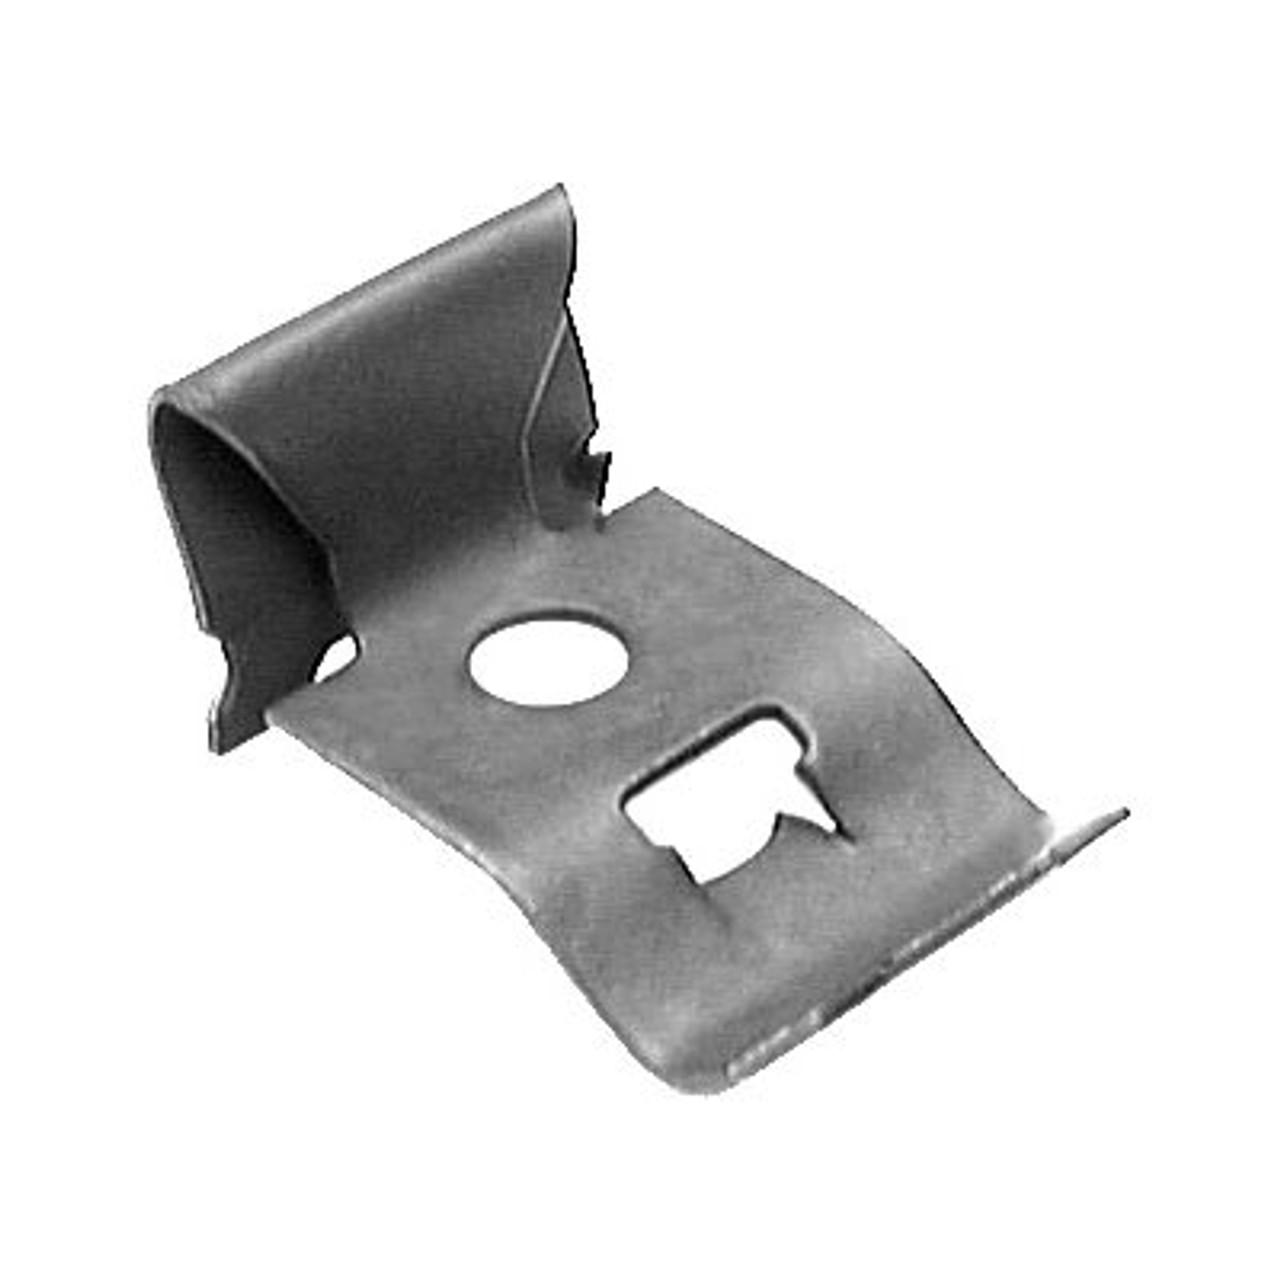 Description : Window Reveal Moulding Clip Front Windshield & Rear WIndow Material : Metal GM OEM:4657731 100 Per Box